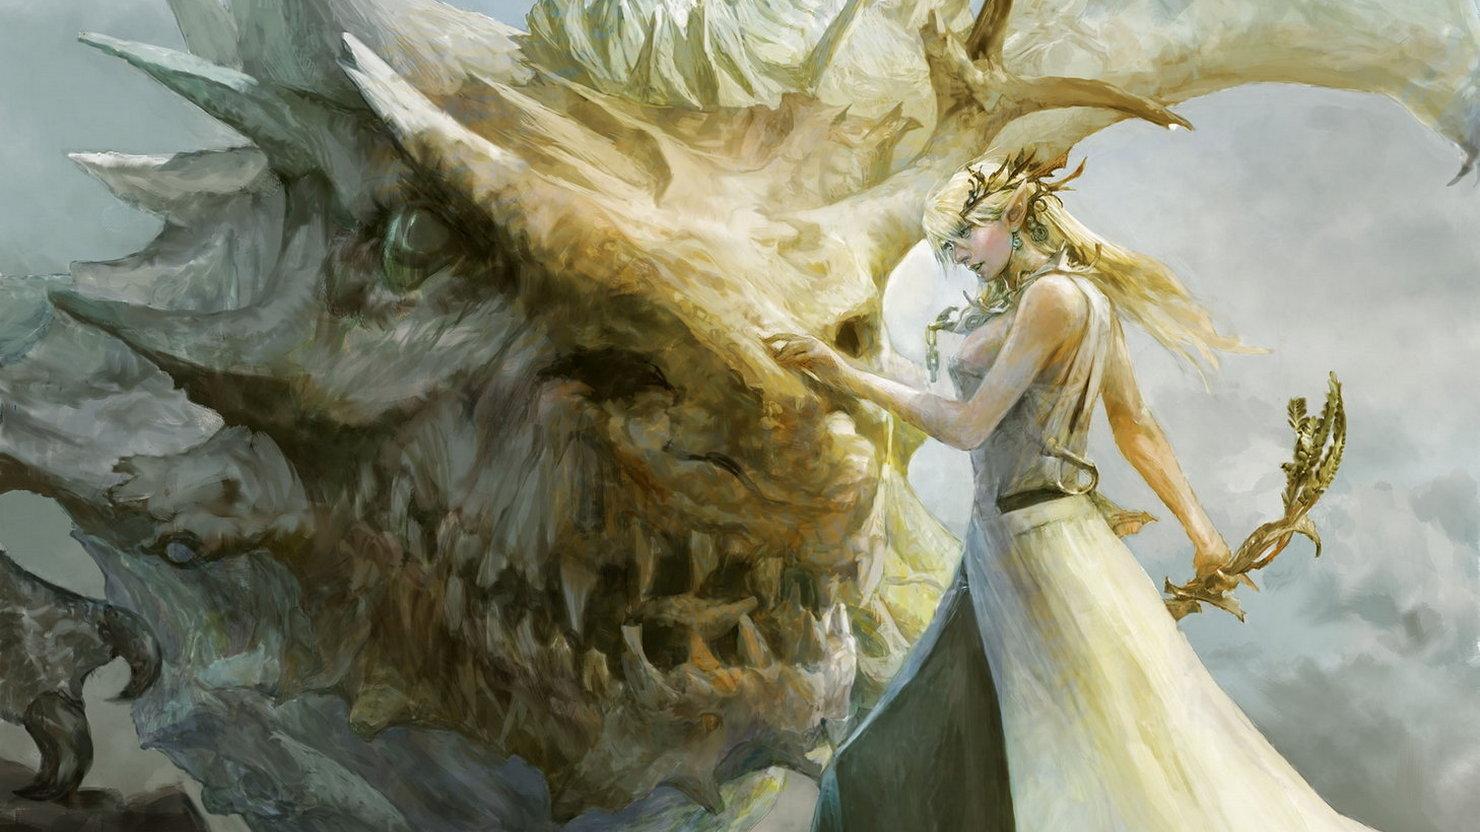 Мелкие новости: Square Enix отменяет Project Prelude Rune и радуется продажам NieR: Automata